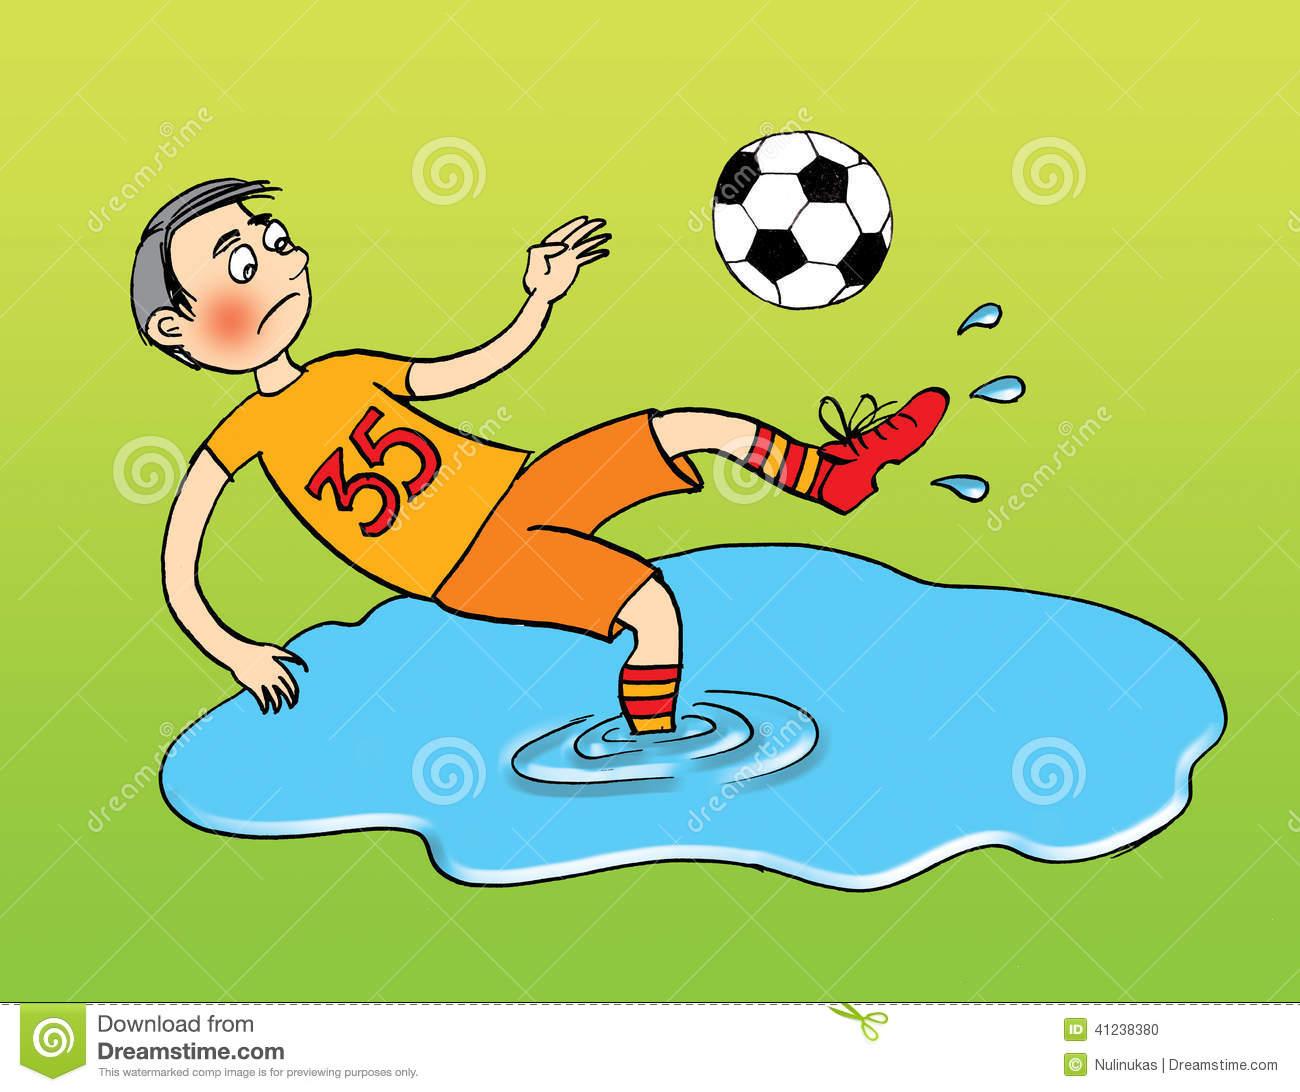 Football Player After Rain, Cartoon Stock Illustration.